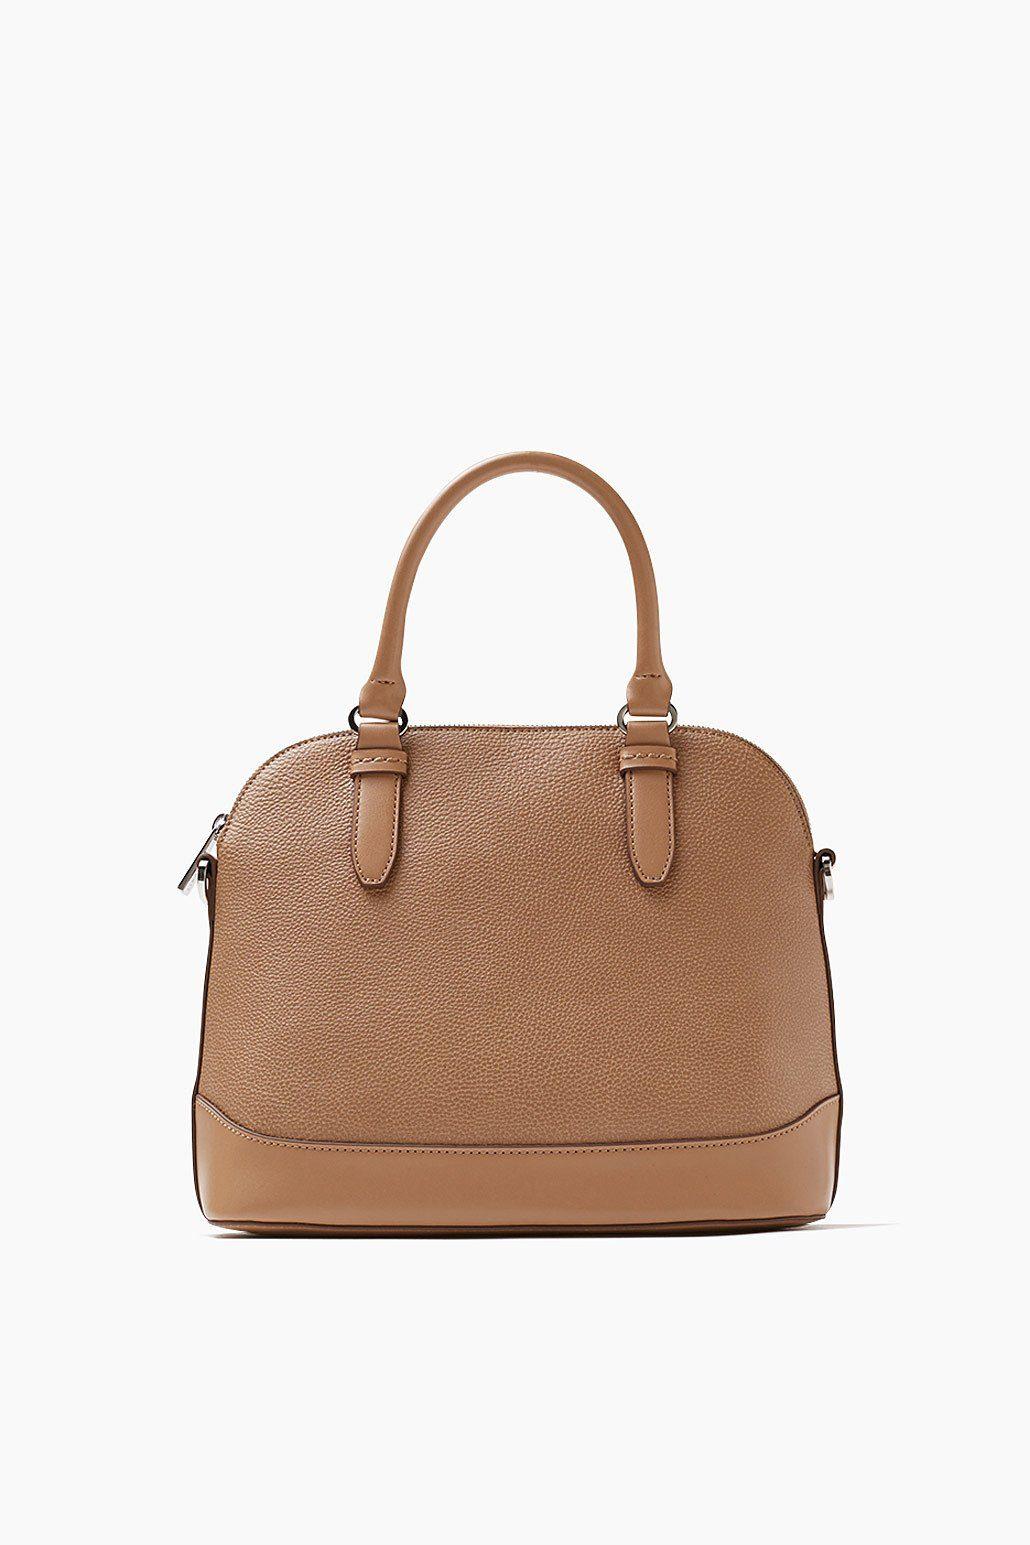 ESPRIT CASUAL Kleine City Bag in Lederoptik